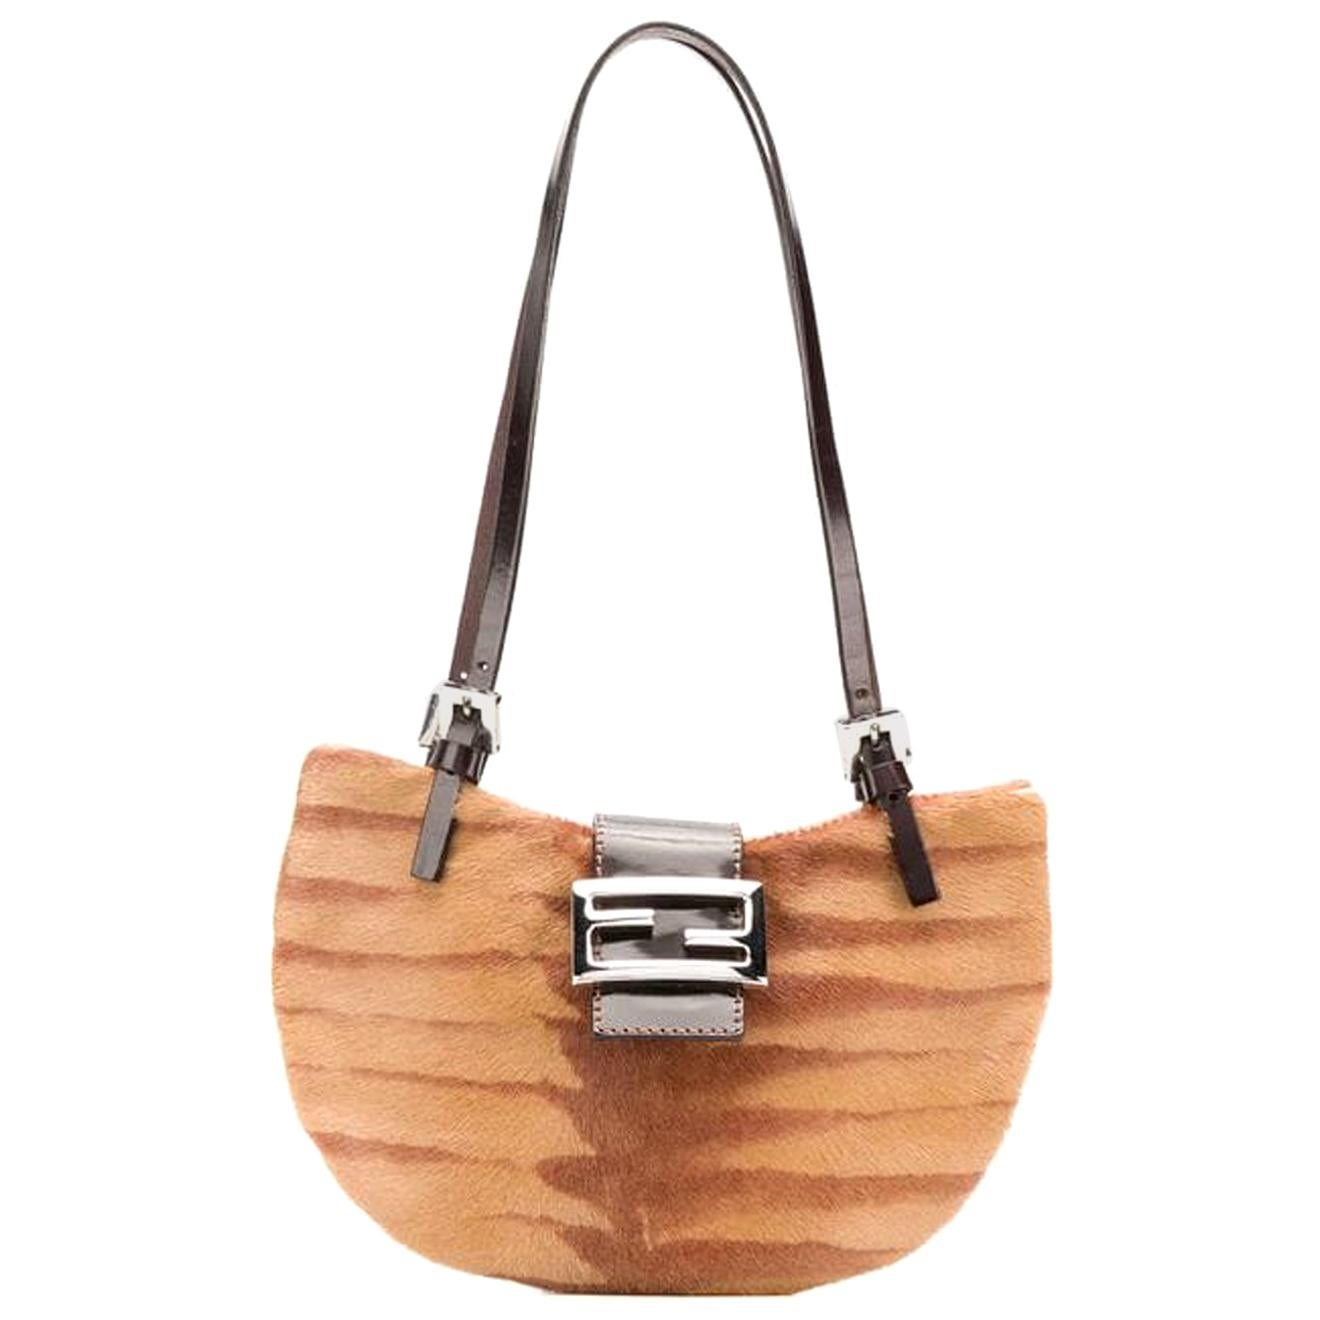 Fendi Camel Leather and Fur Evening Bag